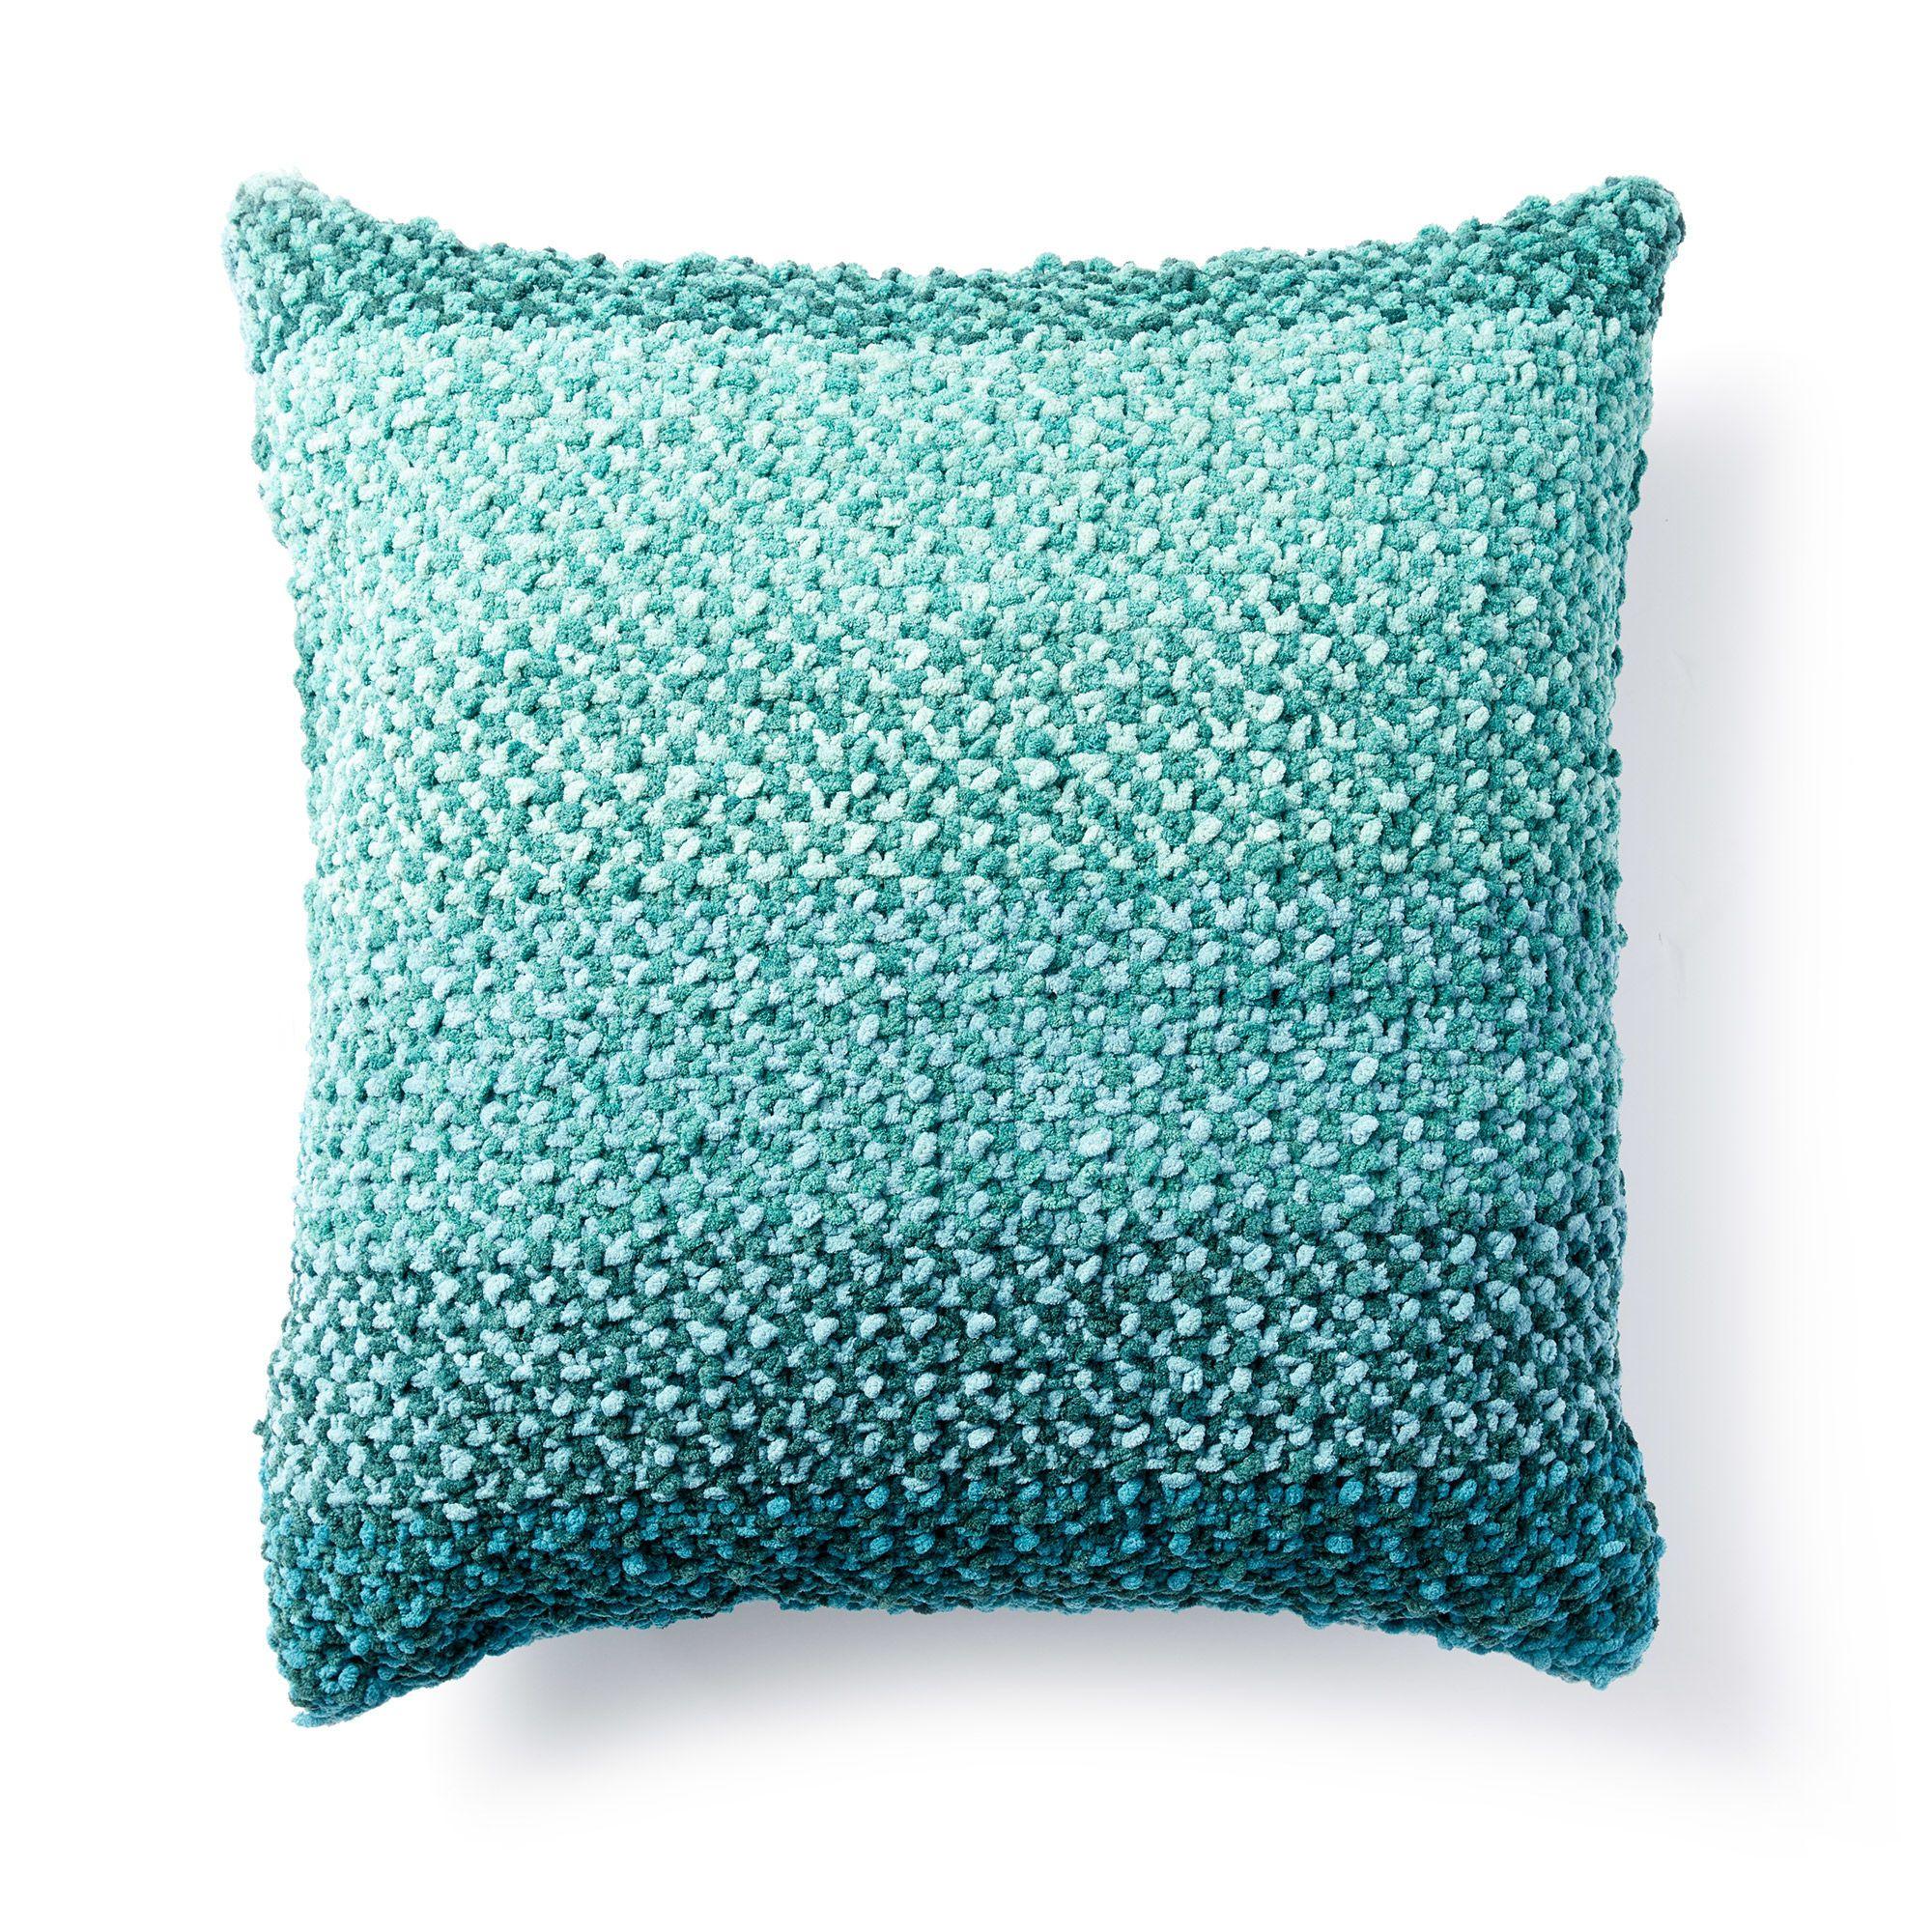 Bernat Warm Ripple Knit Blanket Pattern | Yarnspirations ...